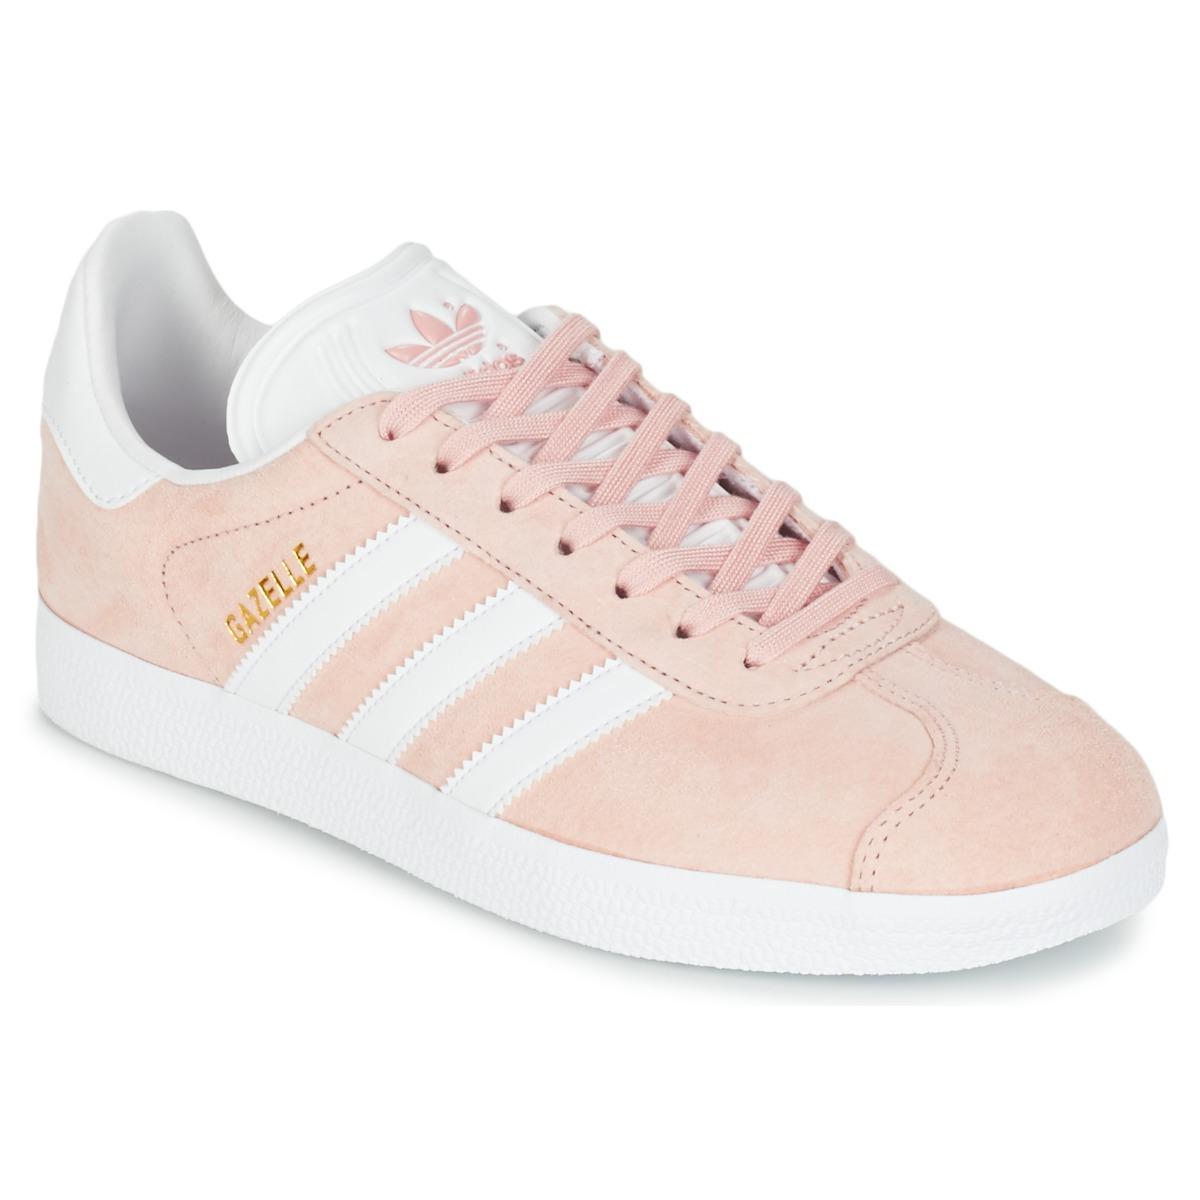 adidas gazelle rosa palo baratas